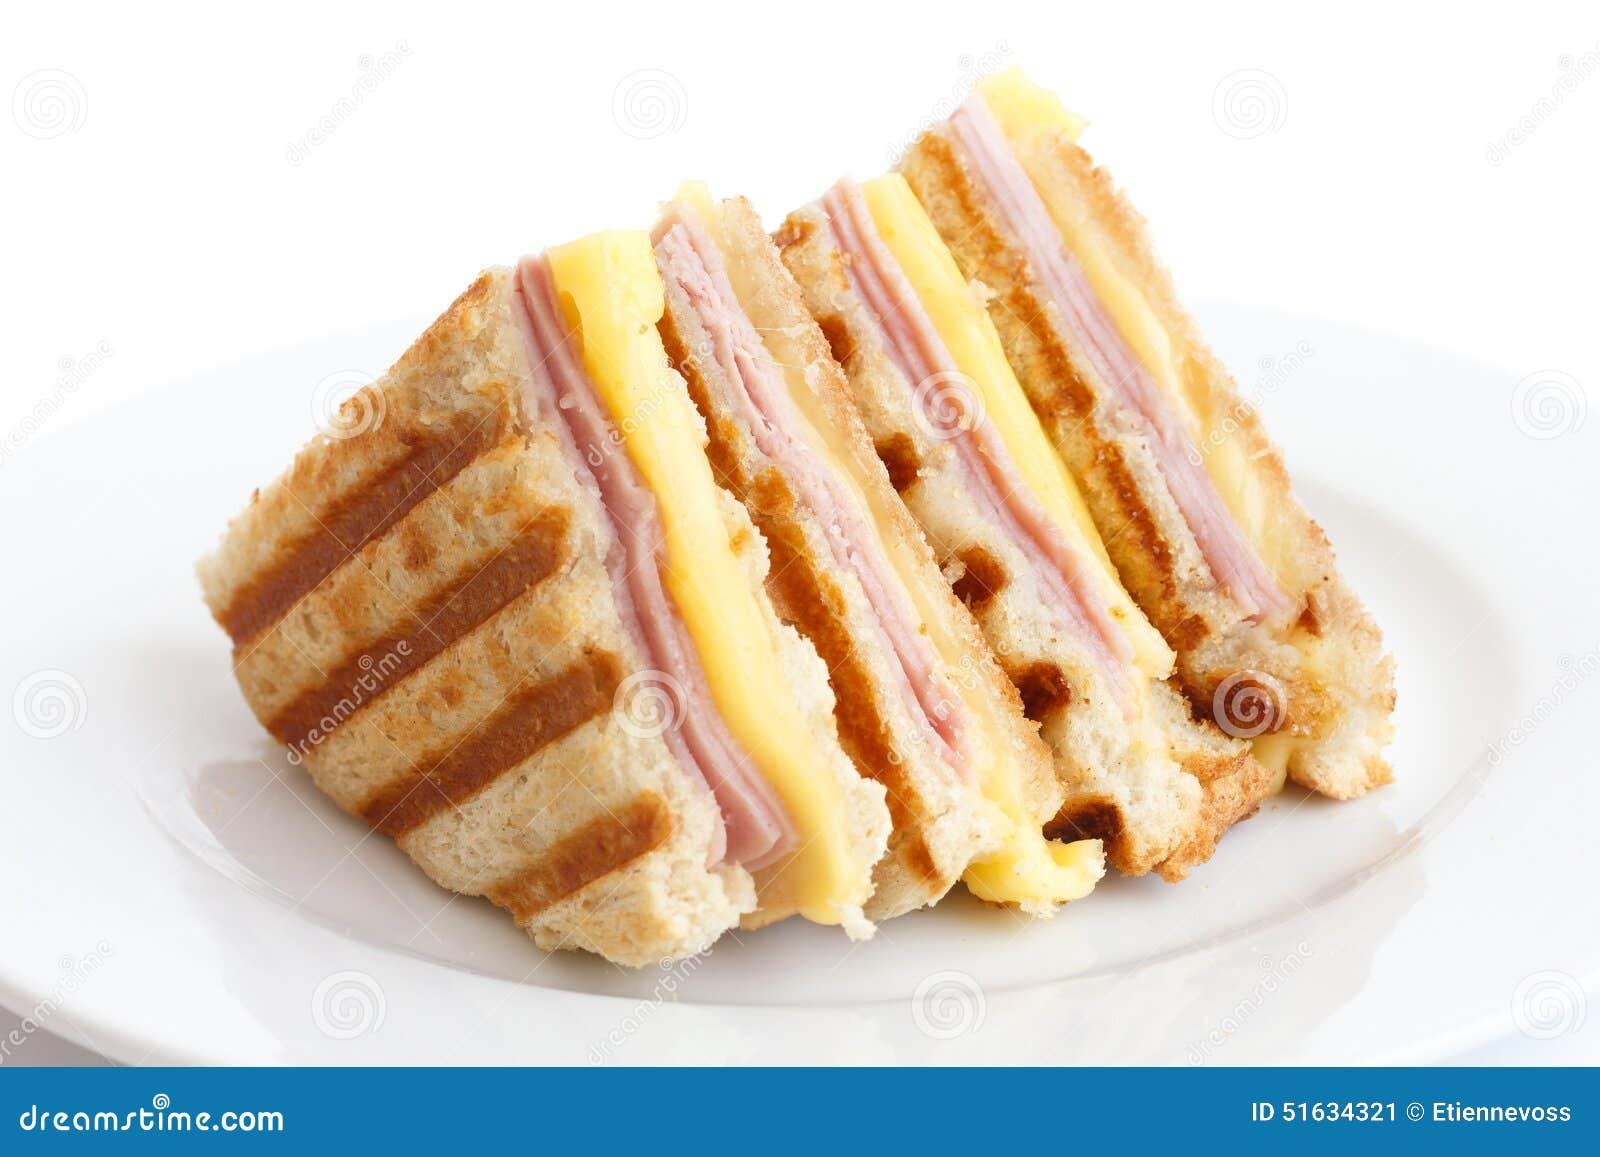 Toasted Ham And Cheese Panini. Stock Photo - Image: 51634321